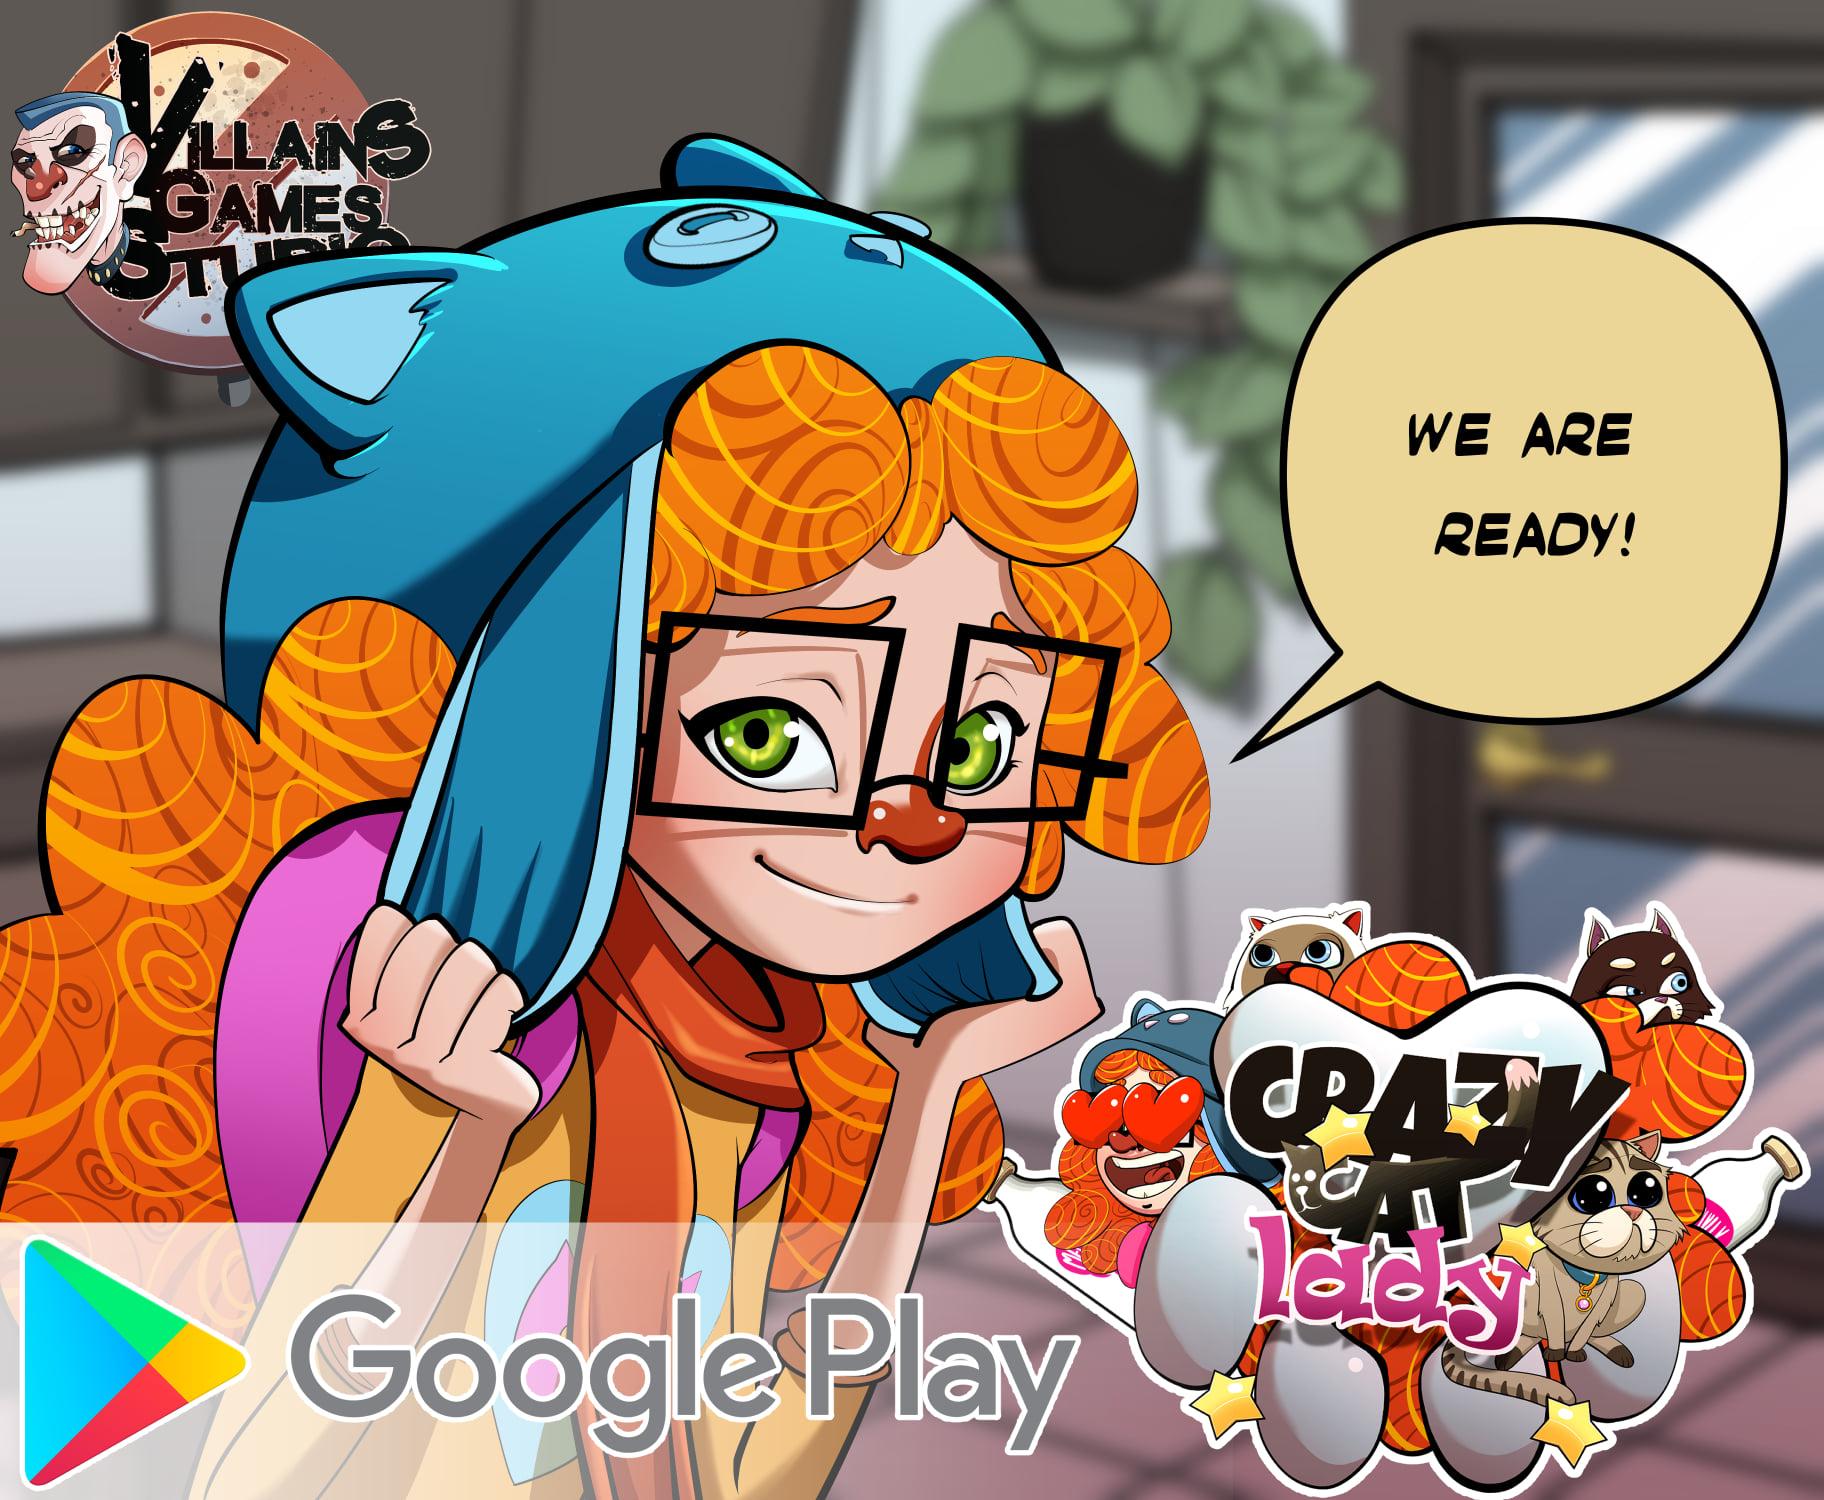 Crazy Cat Lady Google Play